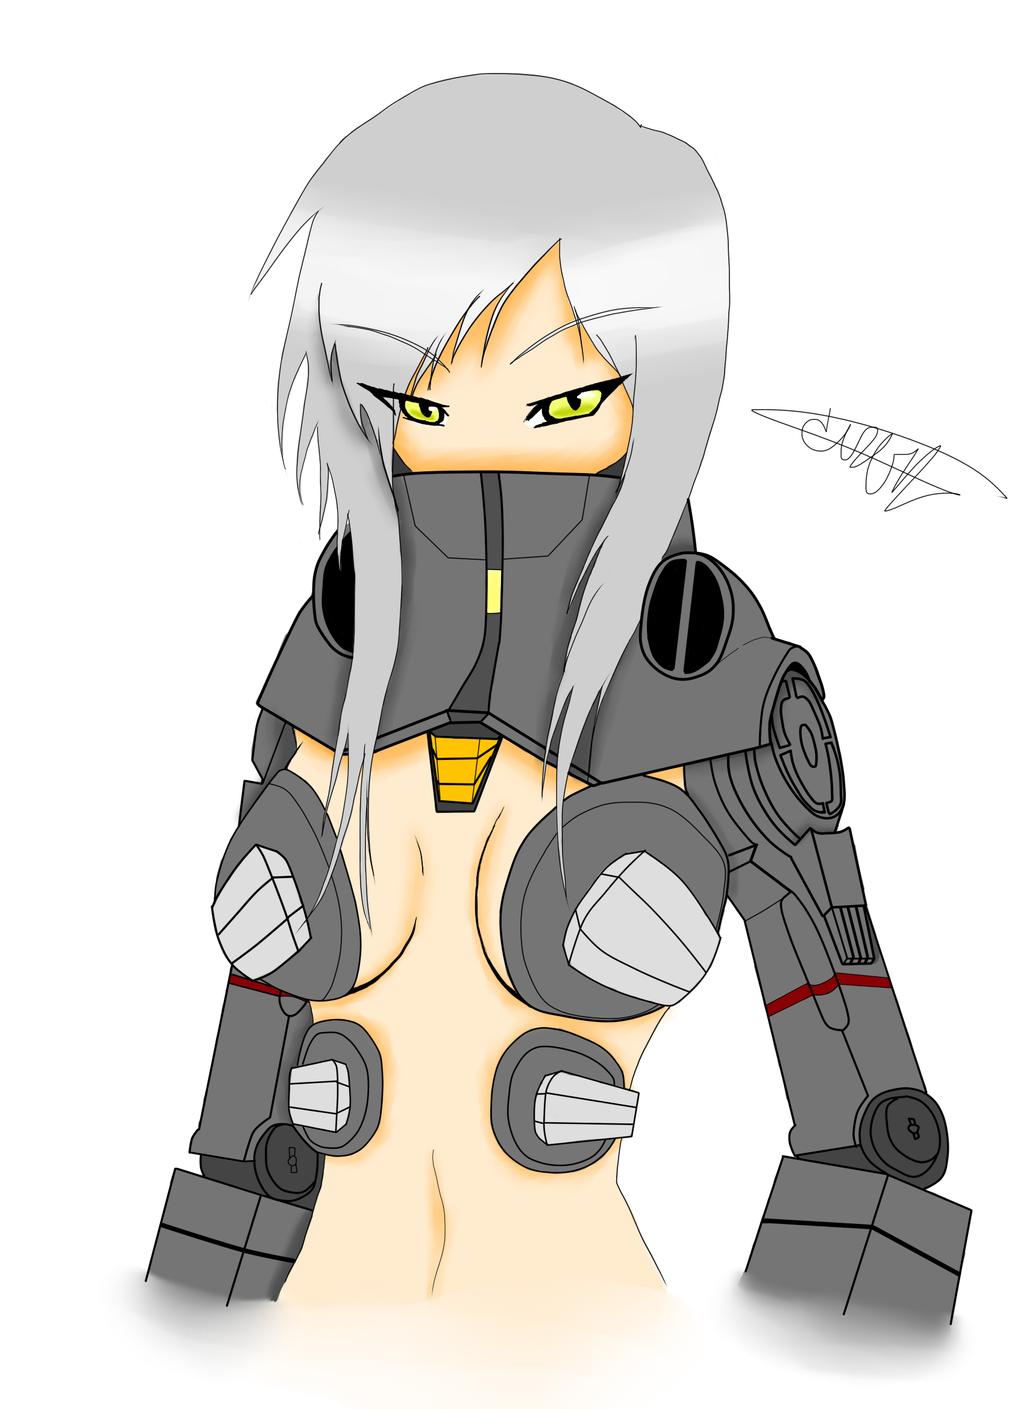 Pacific Rim JaegerGirl: CHERNO ALPHA by CrazyNat2012 on ...